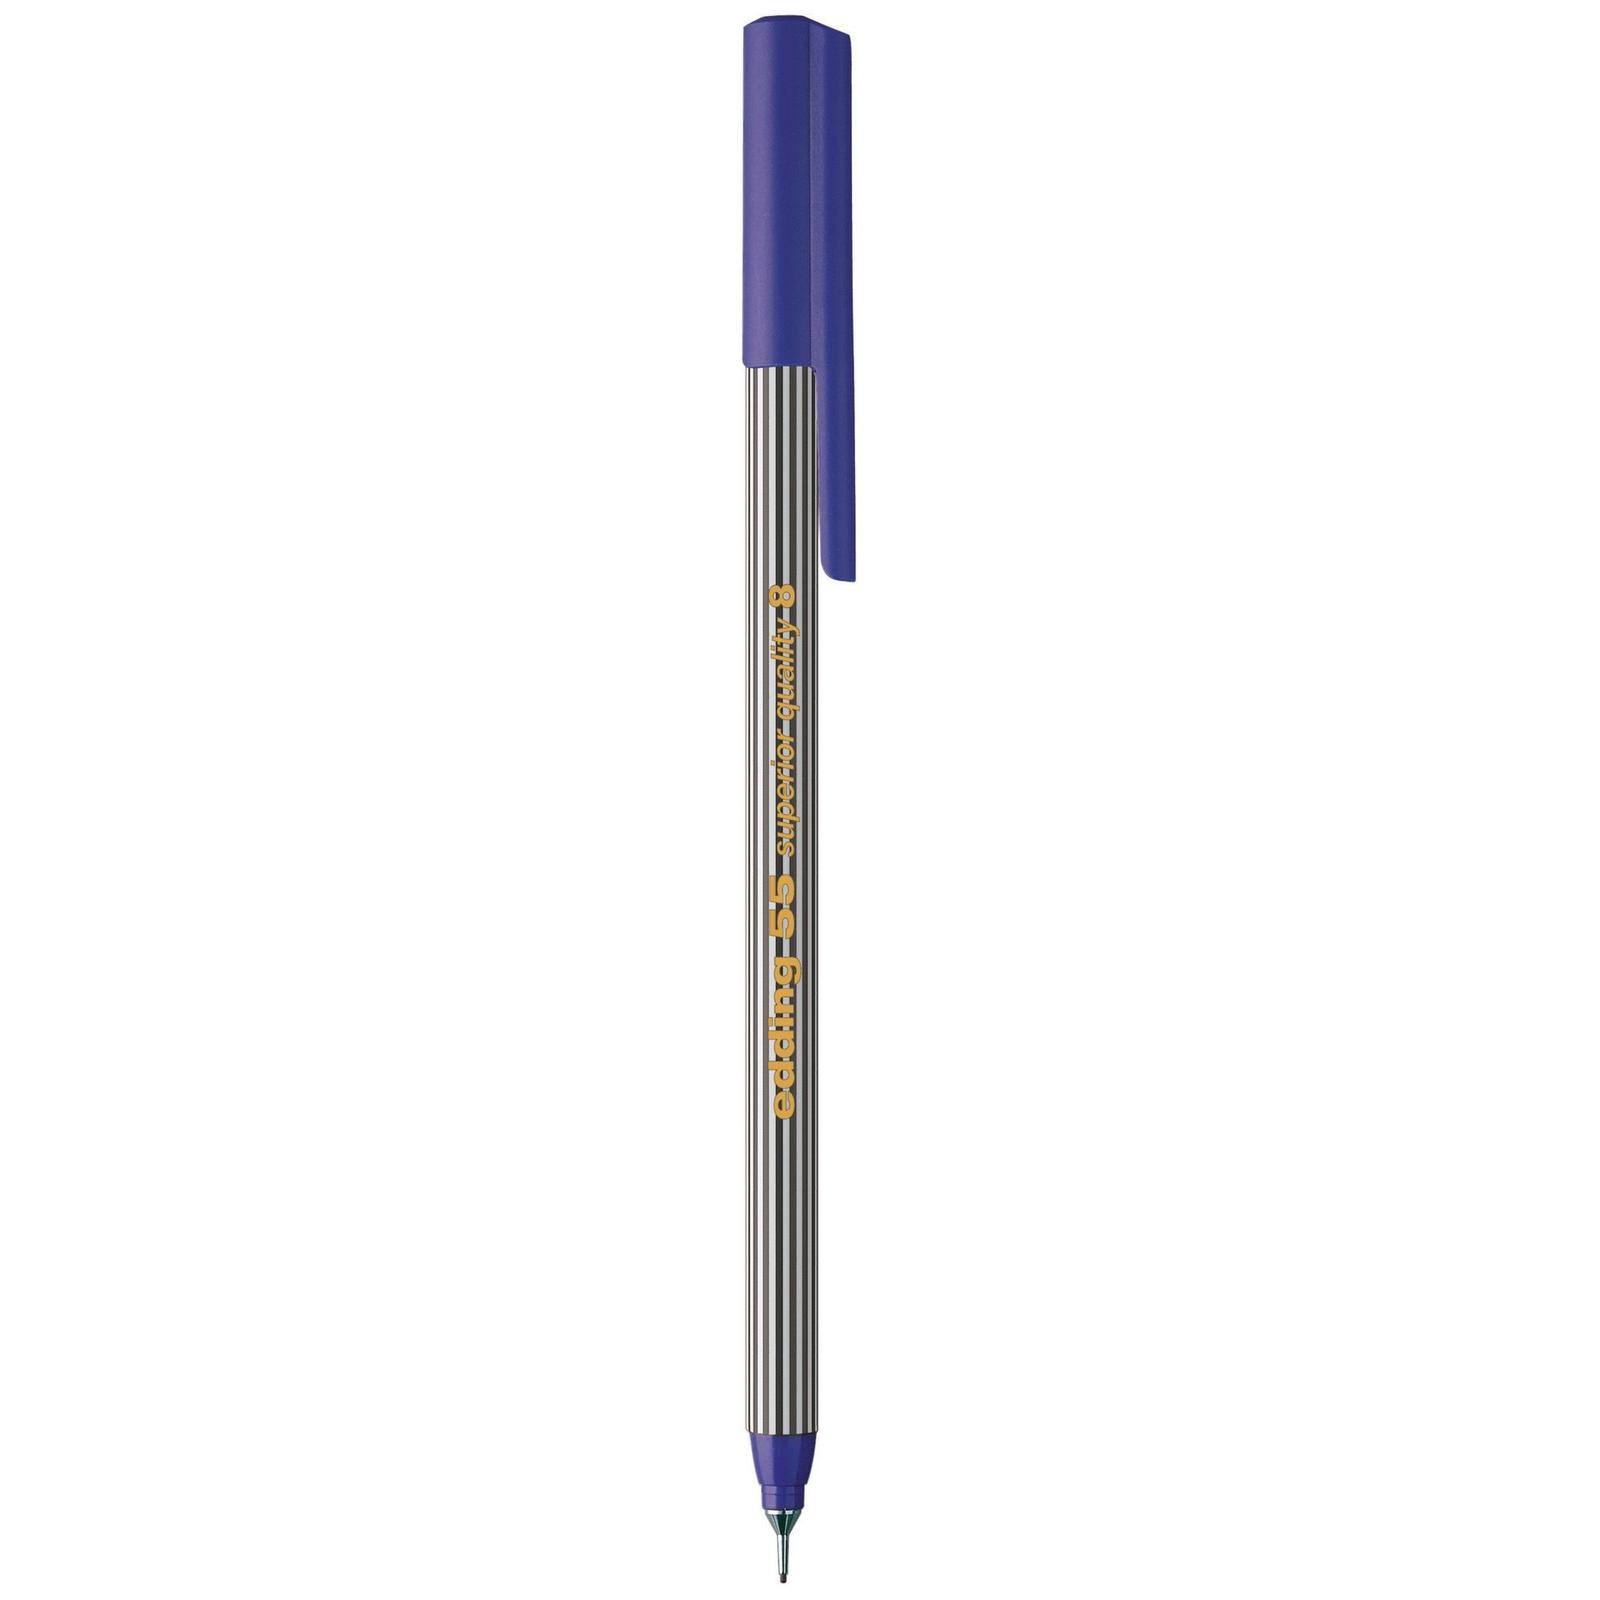 Edding 55 Fineline Fineliner Pen Black - Pack of 10